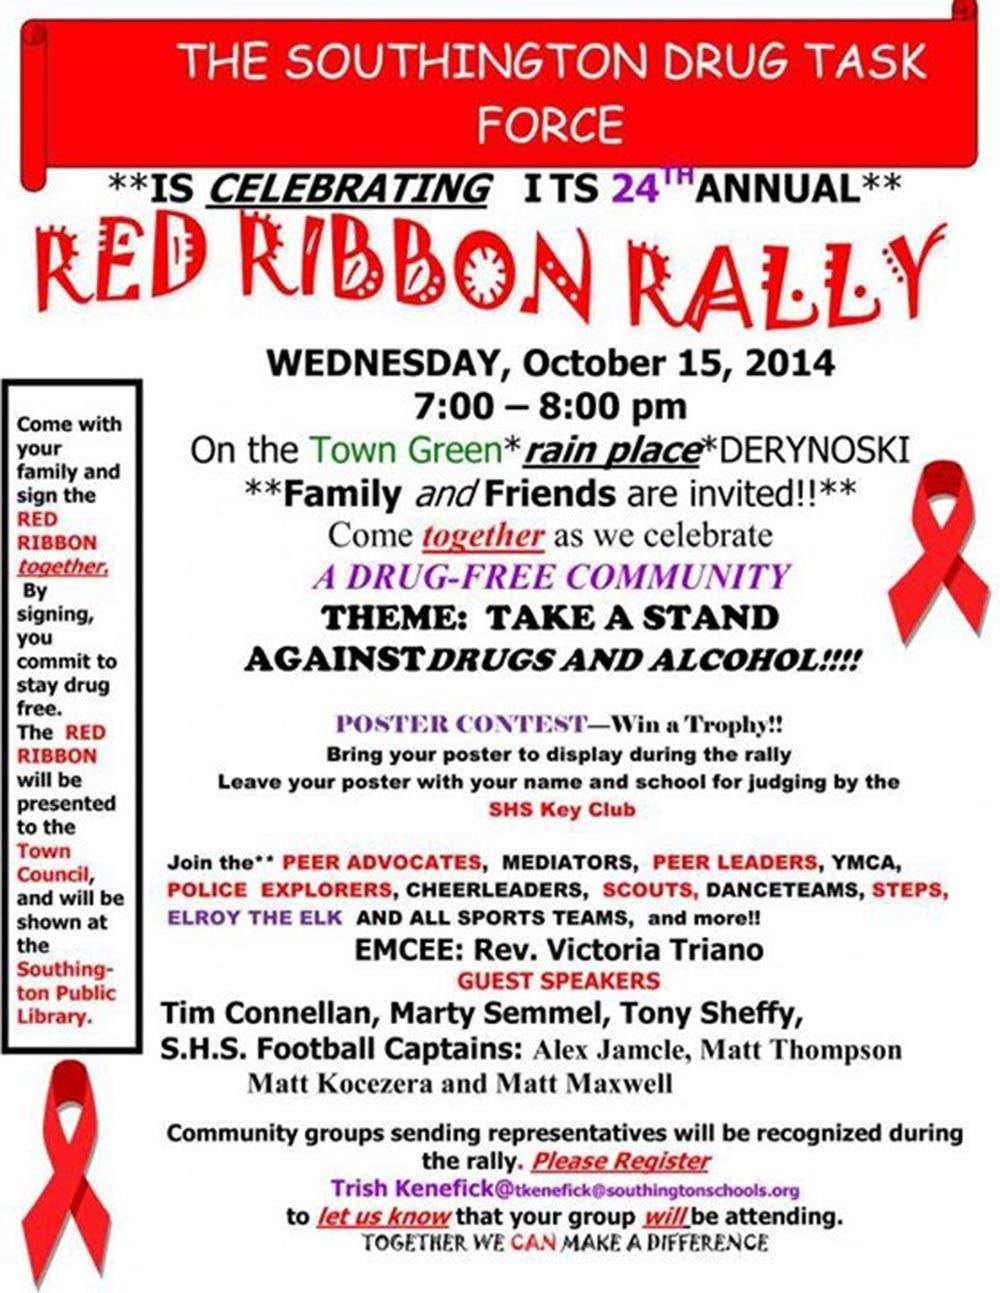 Southington to Celebrate Red Ribbon Rally | Southington, CT